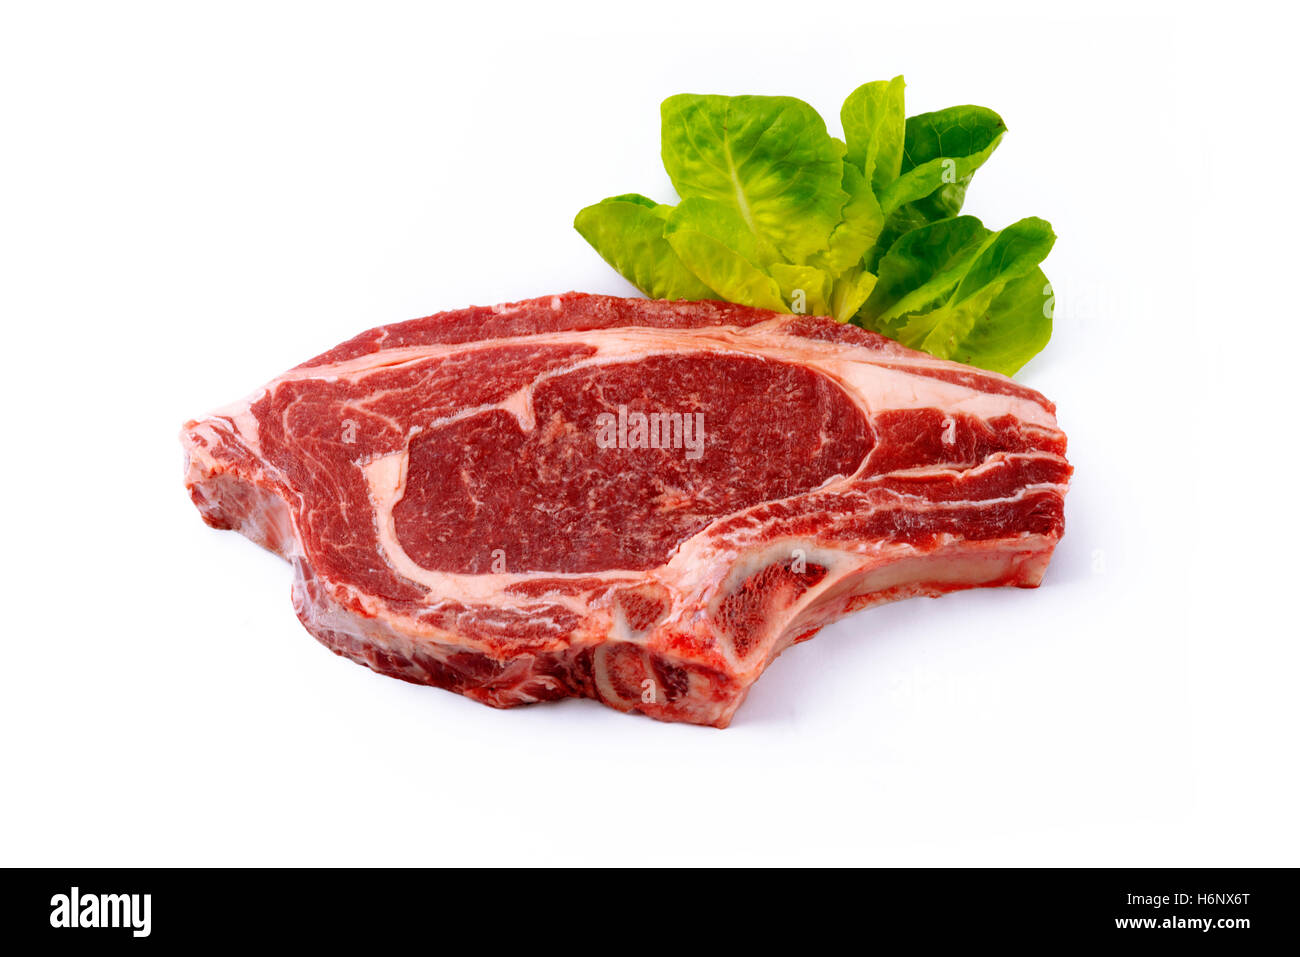 Suculenta oferta de carne orgánica con lechuga aislado sobre un fondo blanco brillante con espacio para texto Imagen De Stock